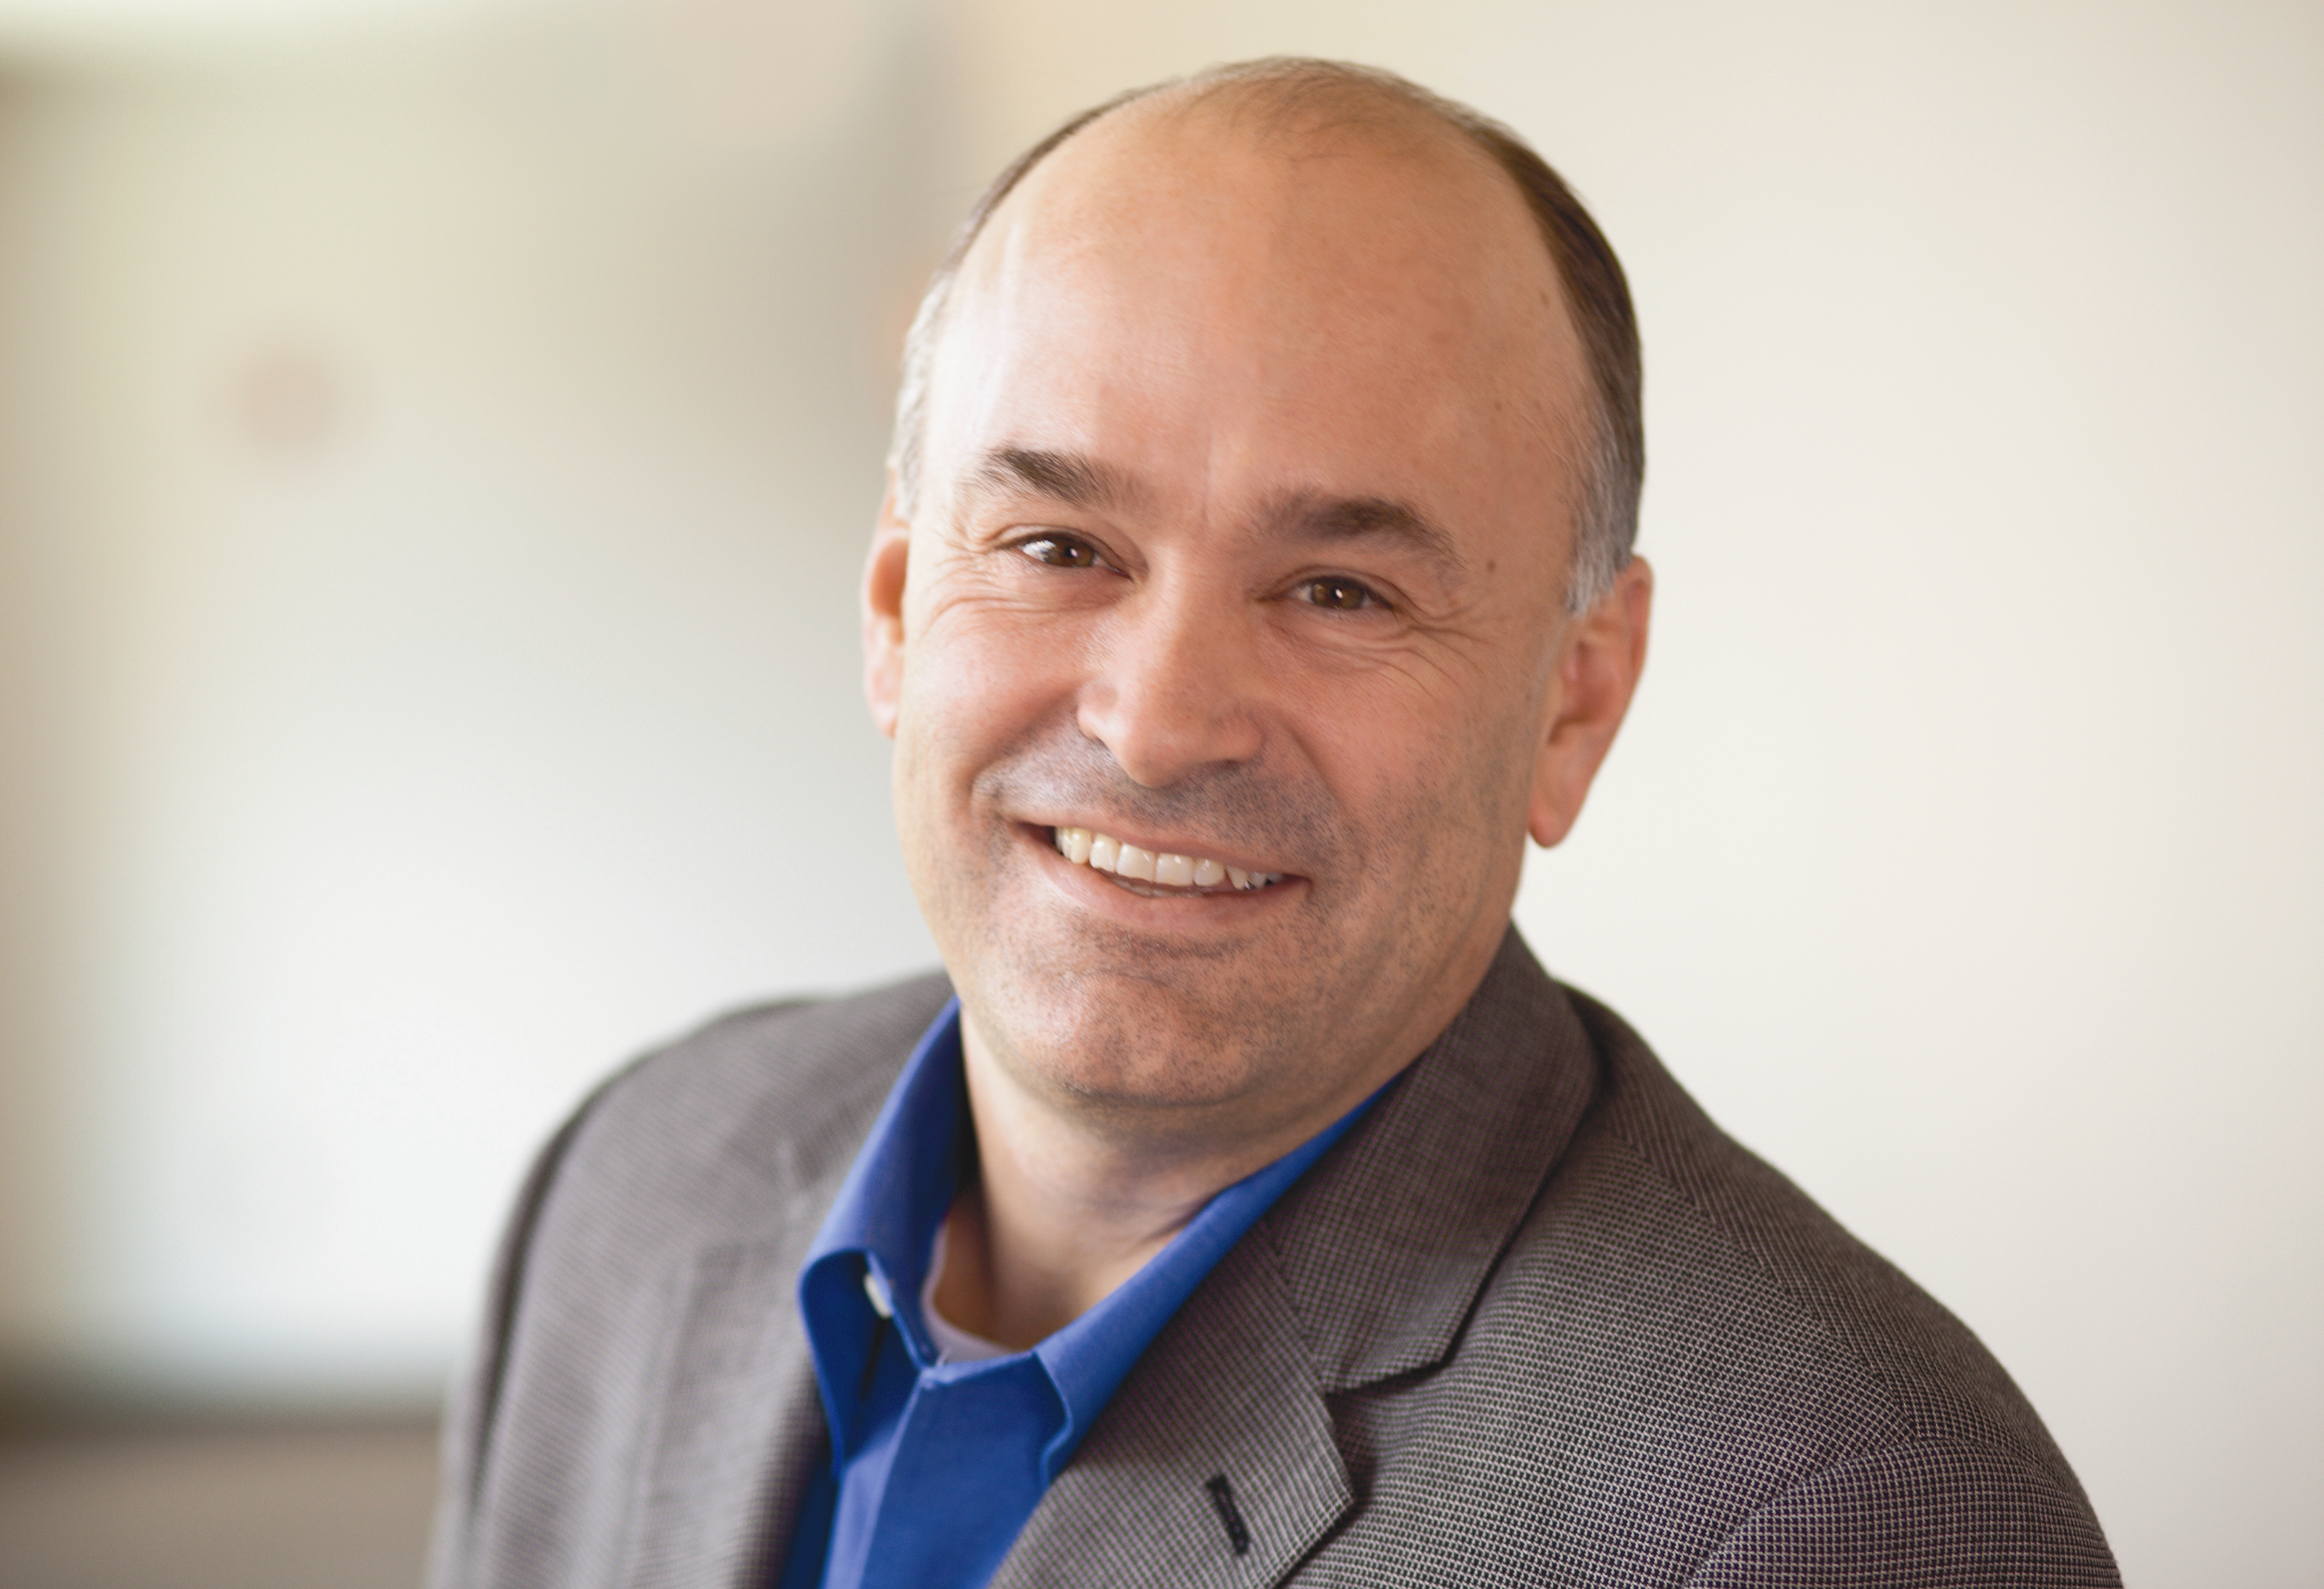 PTC President and CEO Jim Heppelmann.